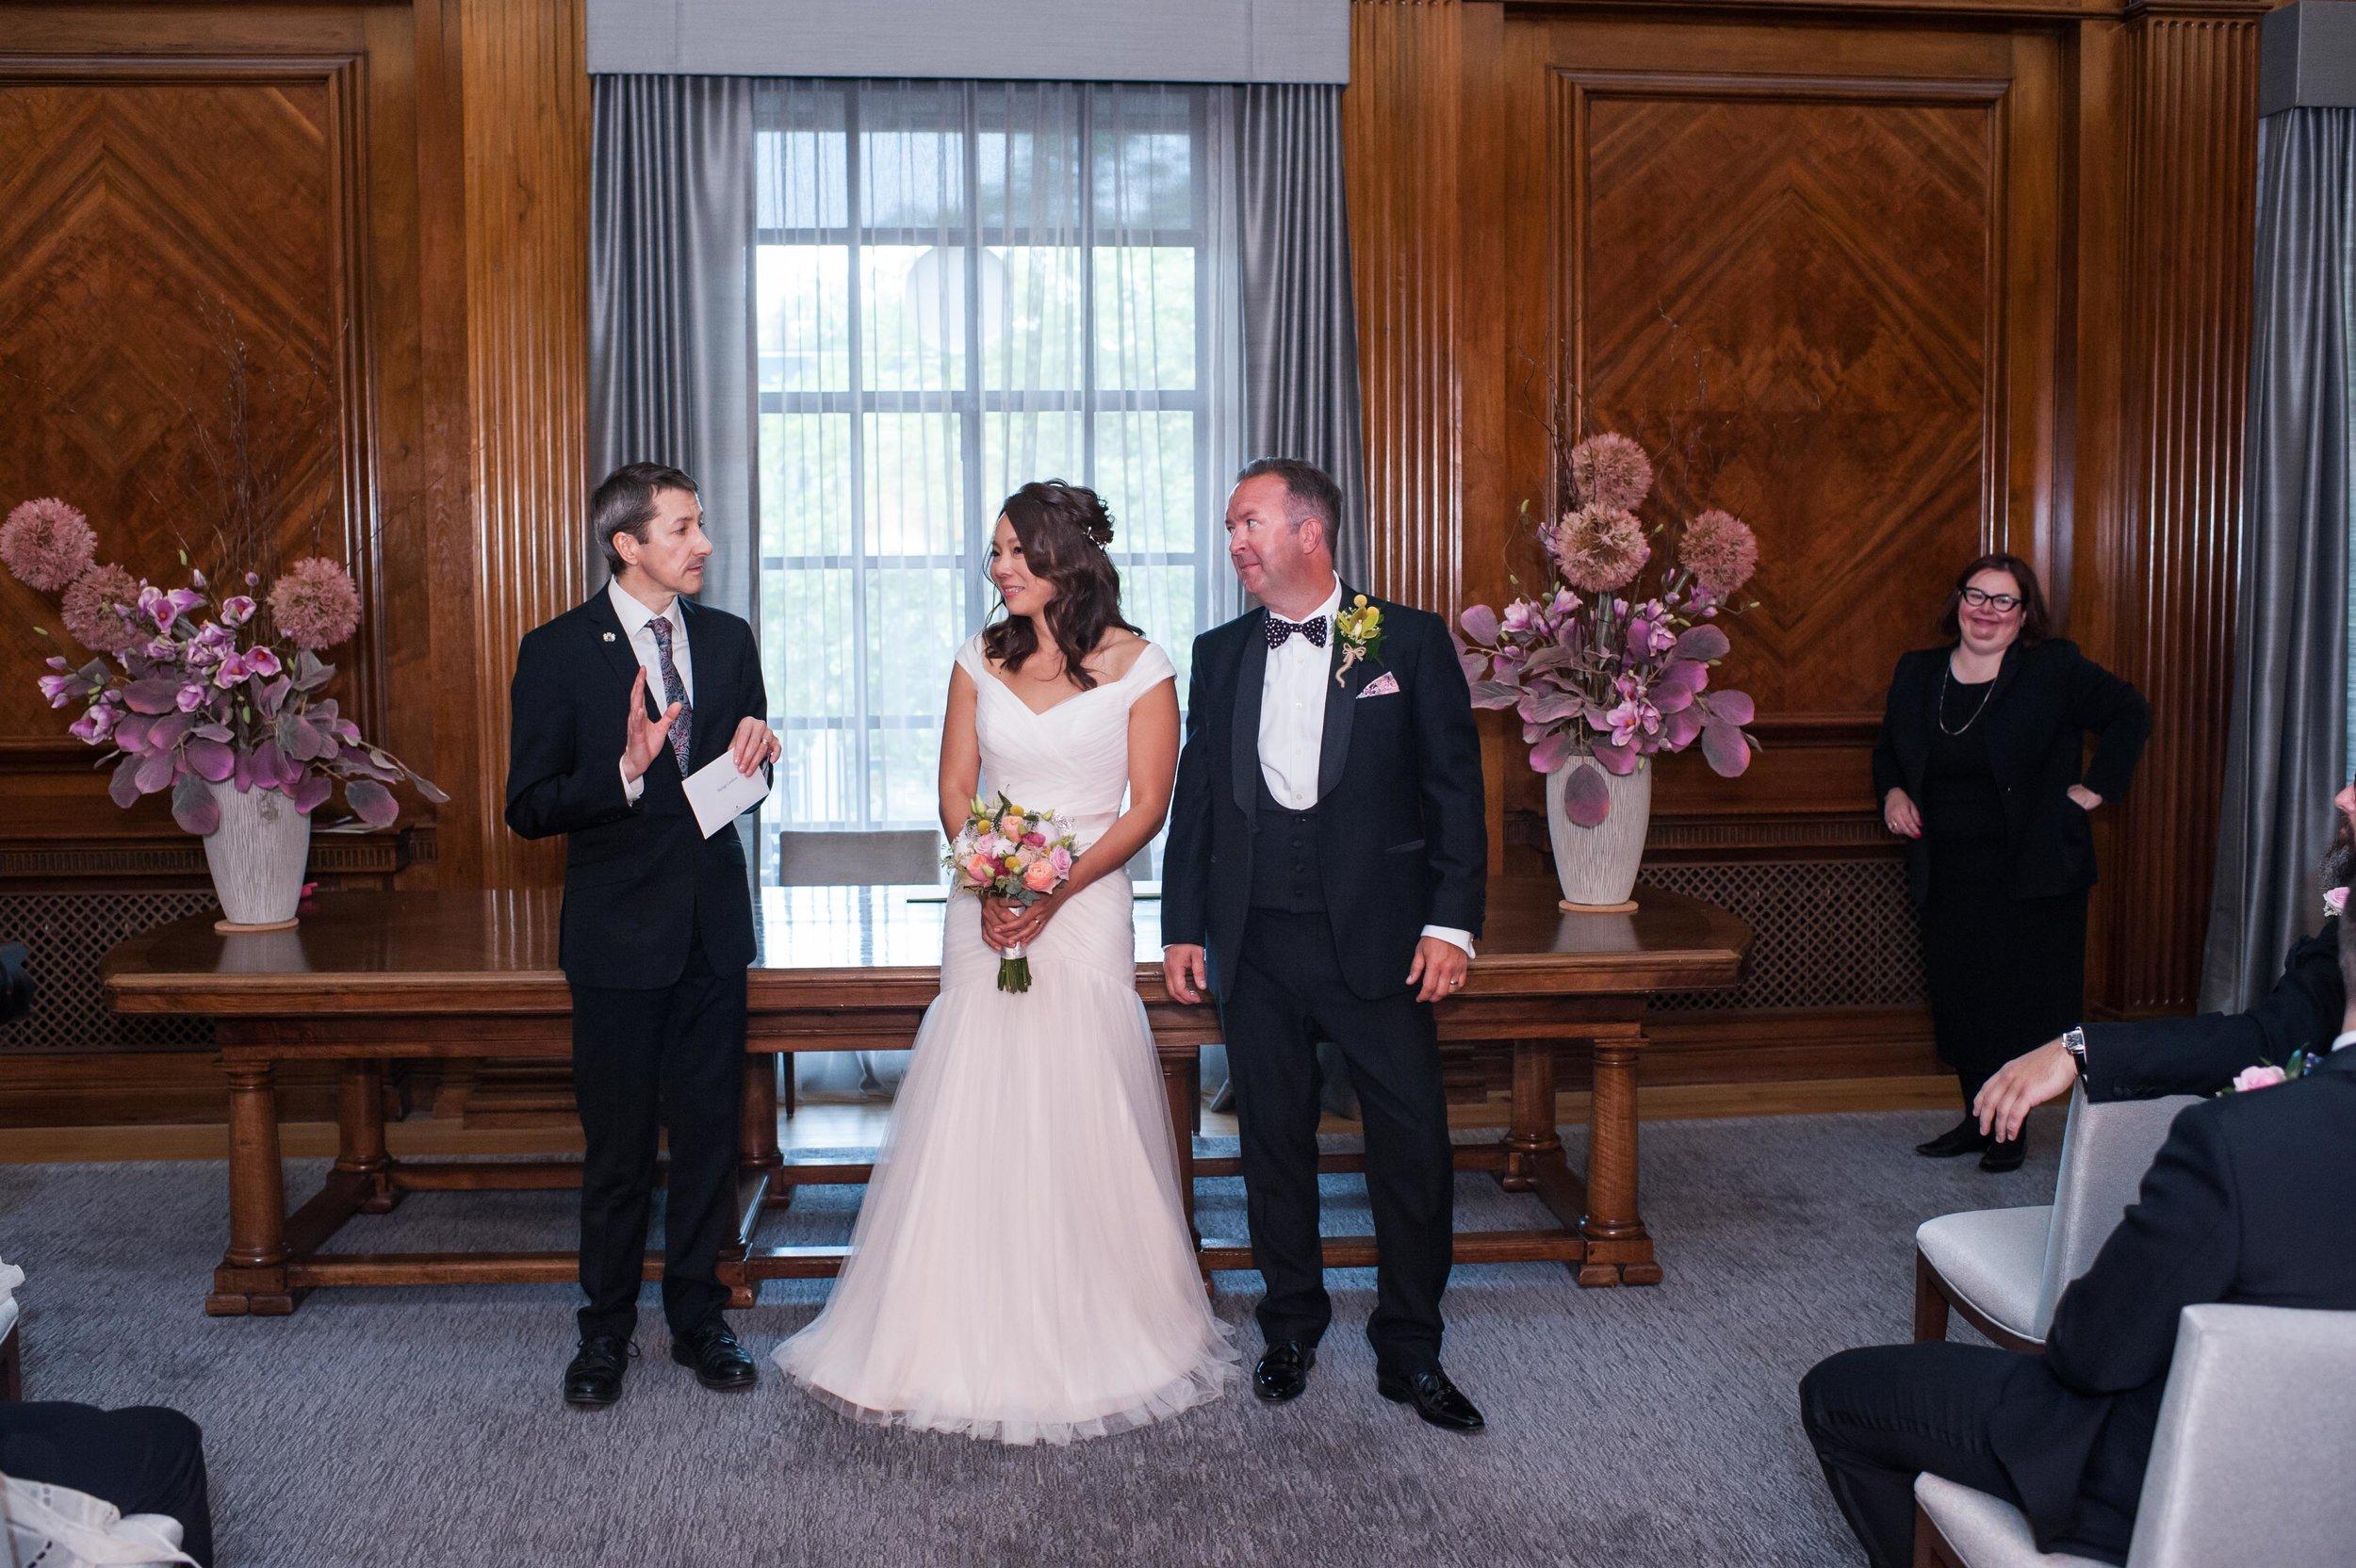 D&M_Marylebone Town Hall Wedding (115 of 239).jpg